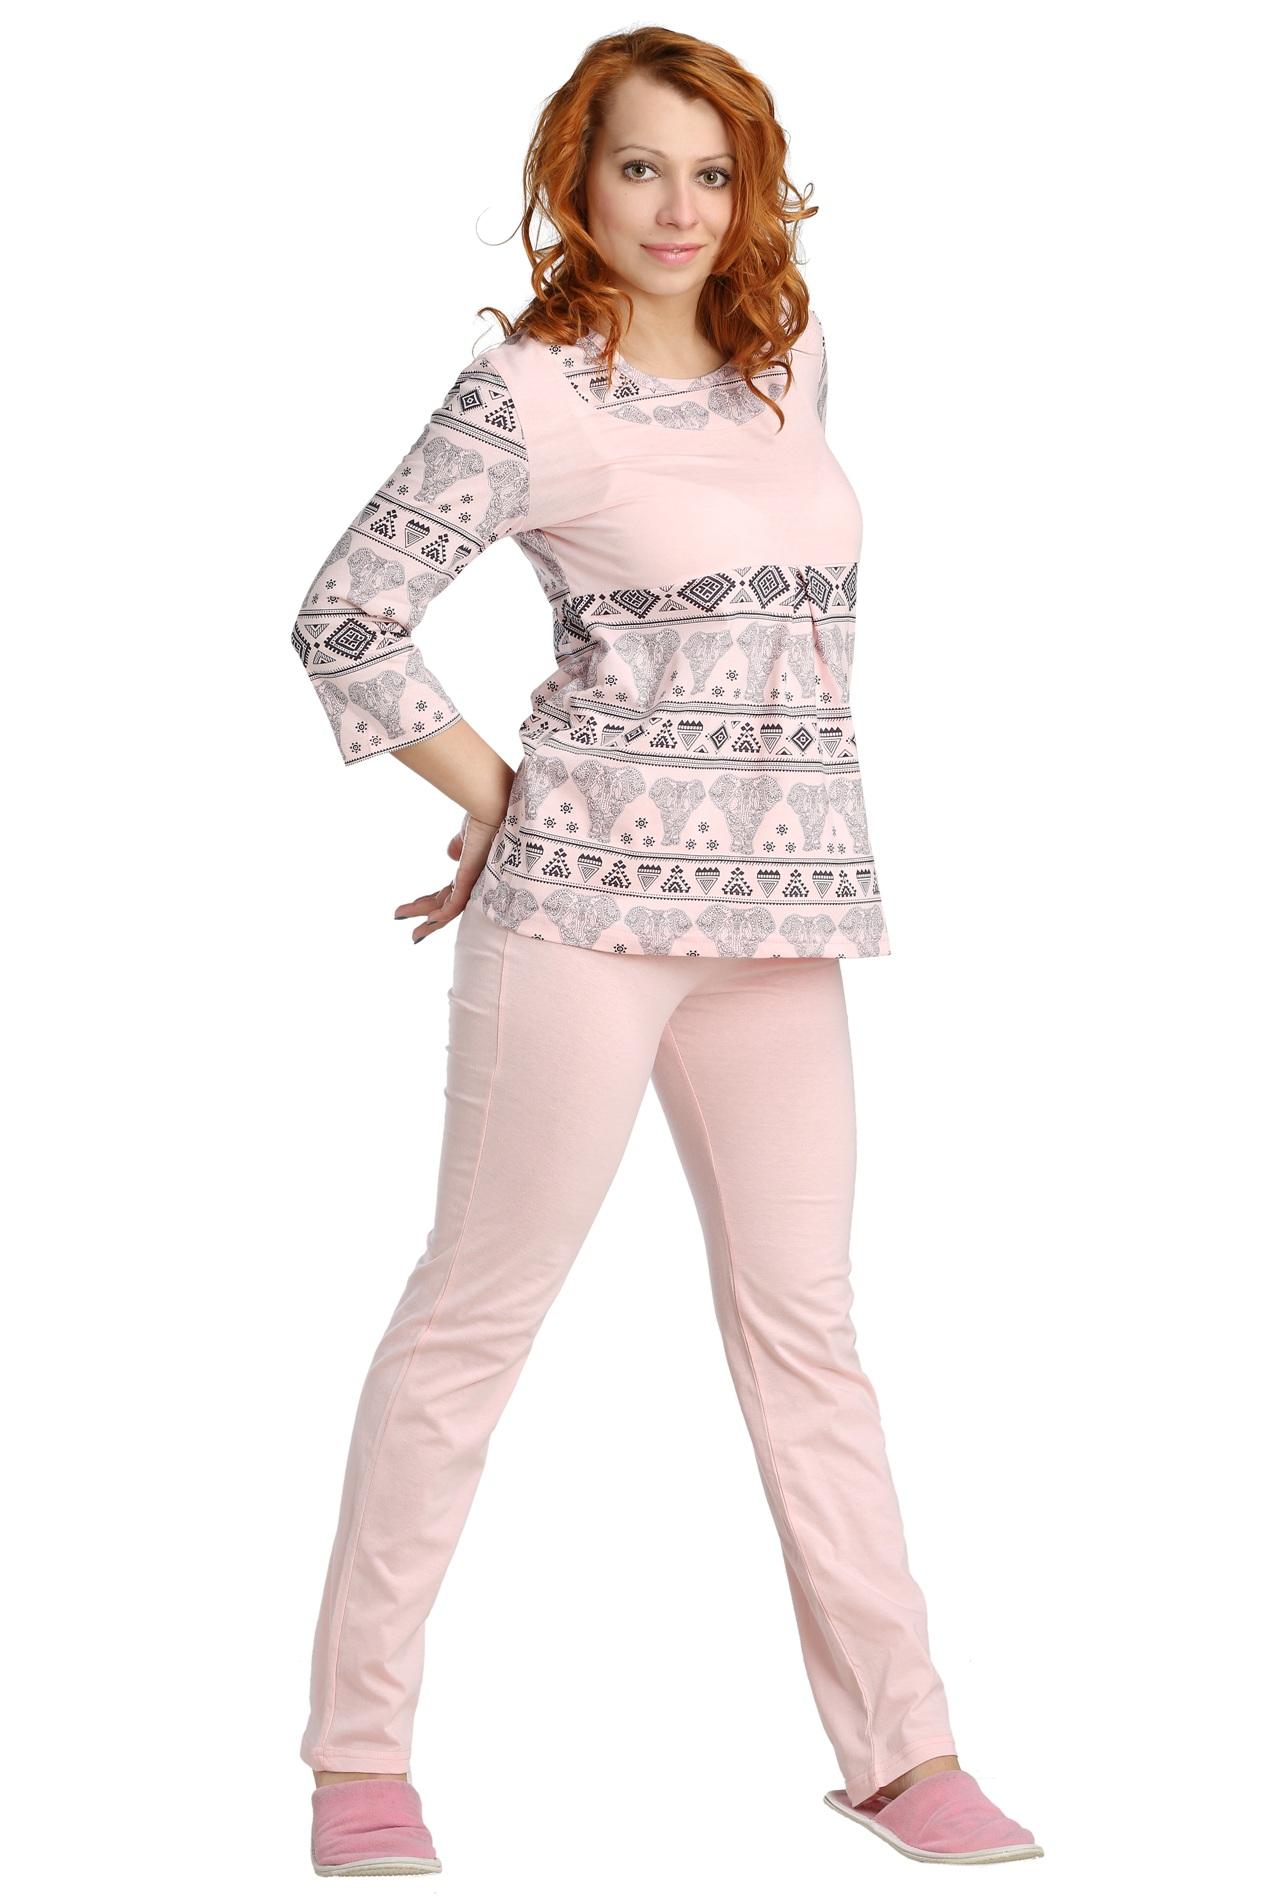 Жен. пижама арт. 16-0087 Розовый р. 50 - Женская одежда артикул: 22000